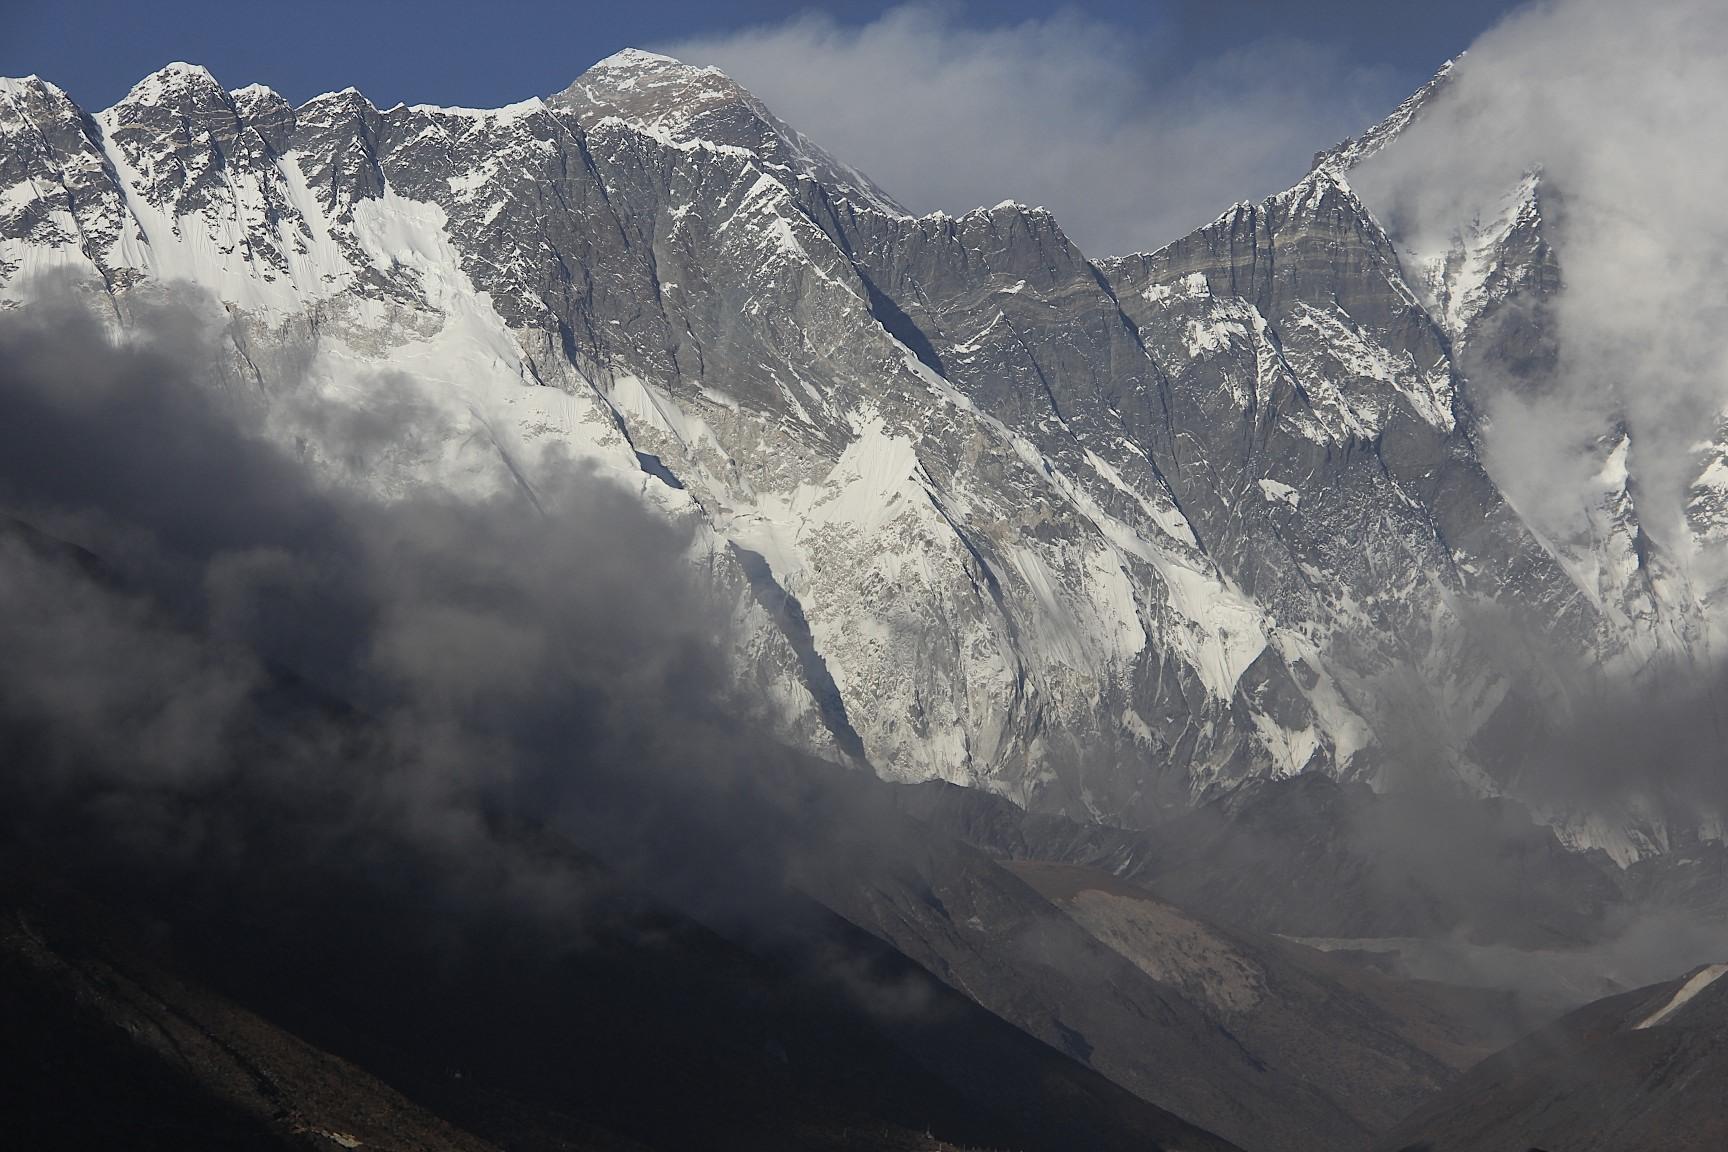 Nuptse, Lhotse and Mt. Everest from Tangboche Monastery